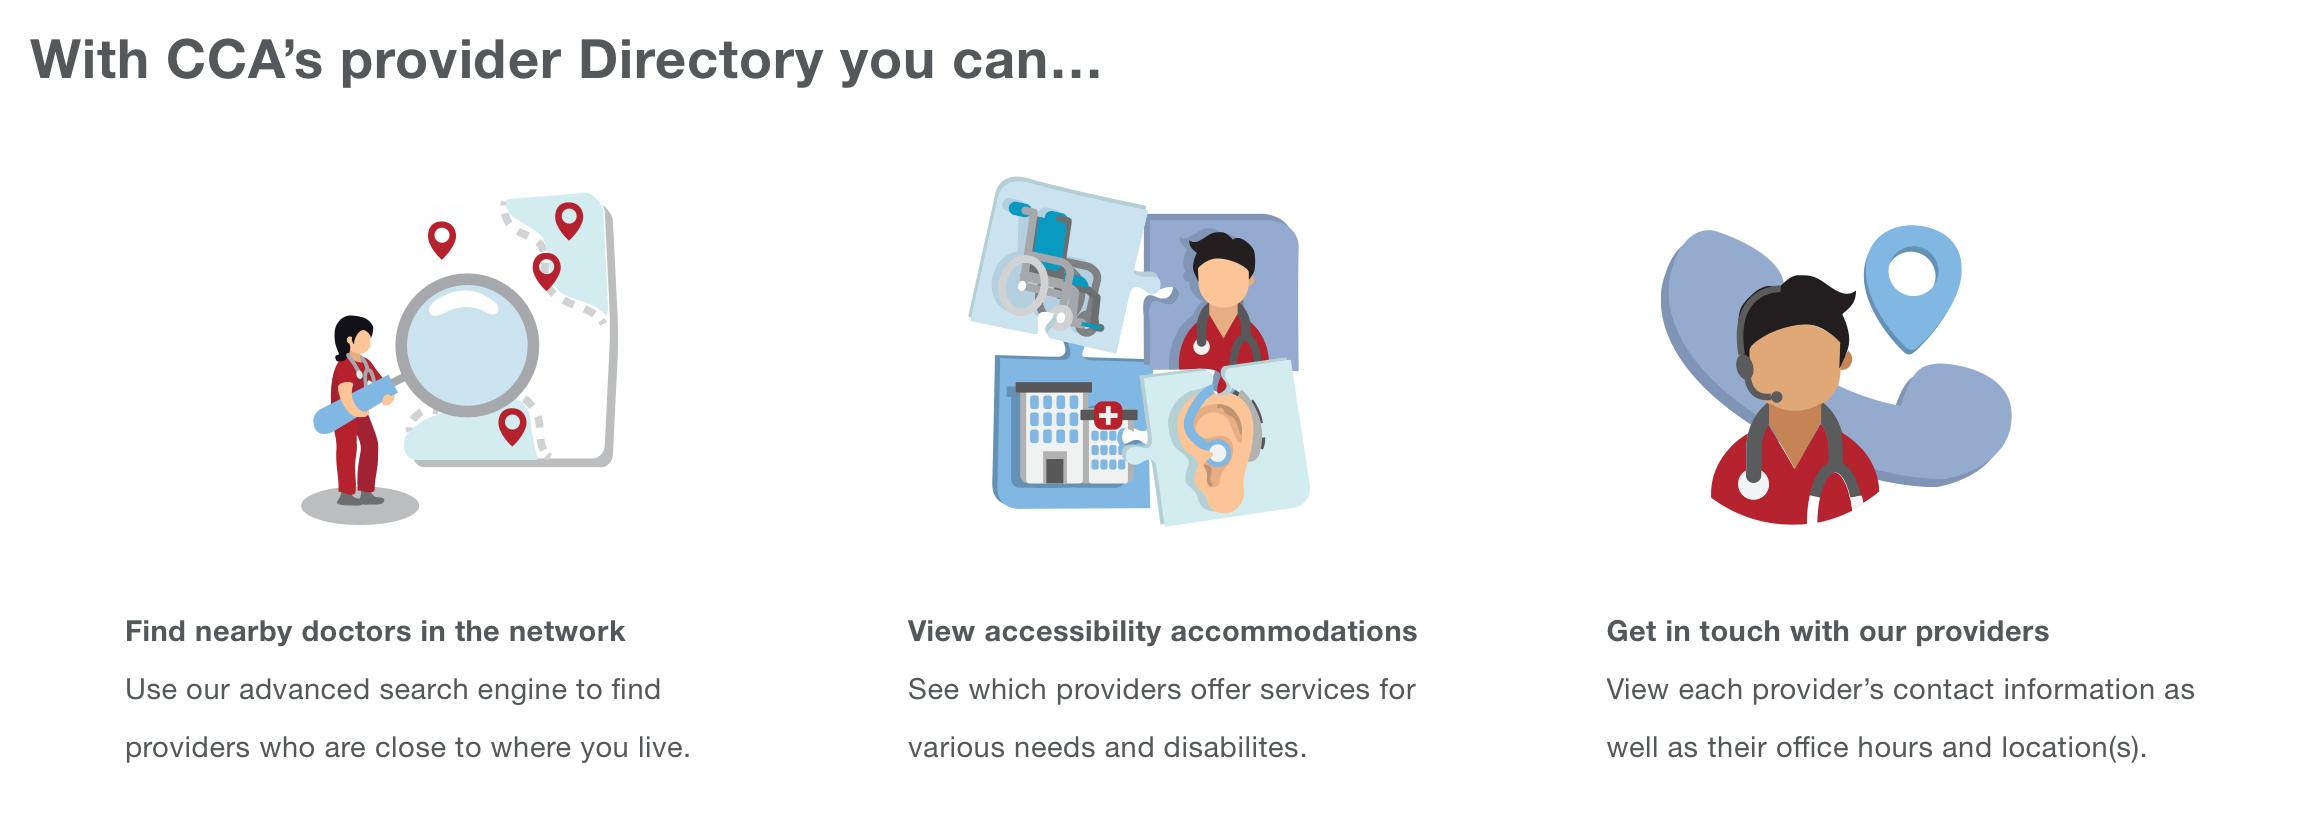 Infographics explaining CCA's Provider Directory (Adobe Illustrator)